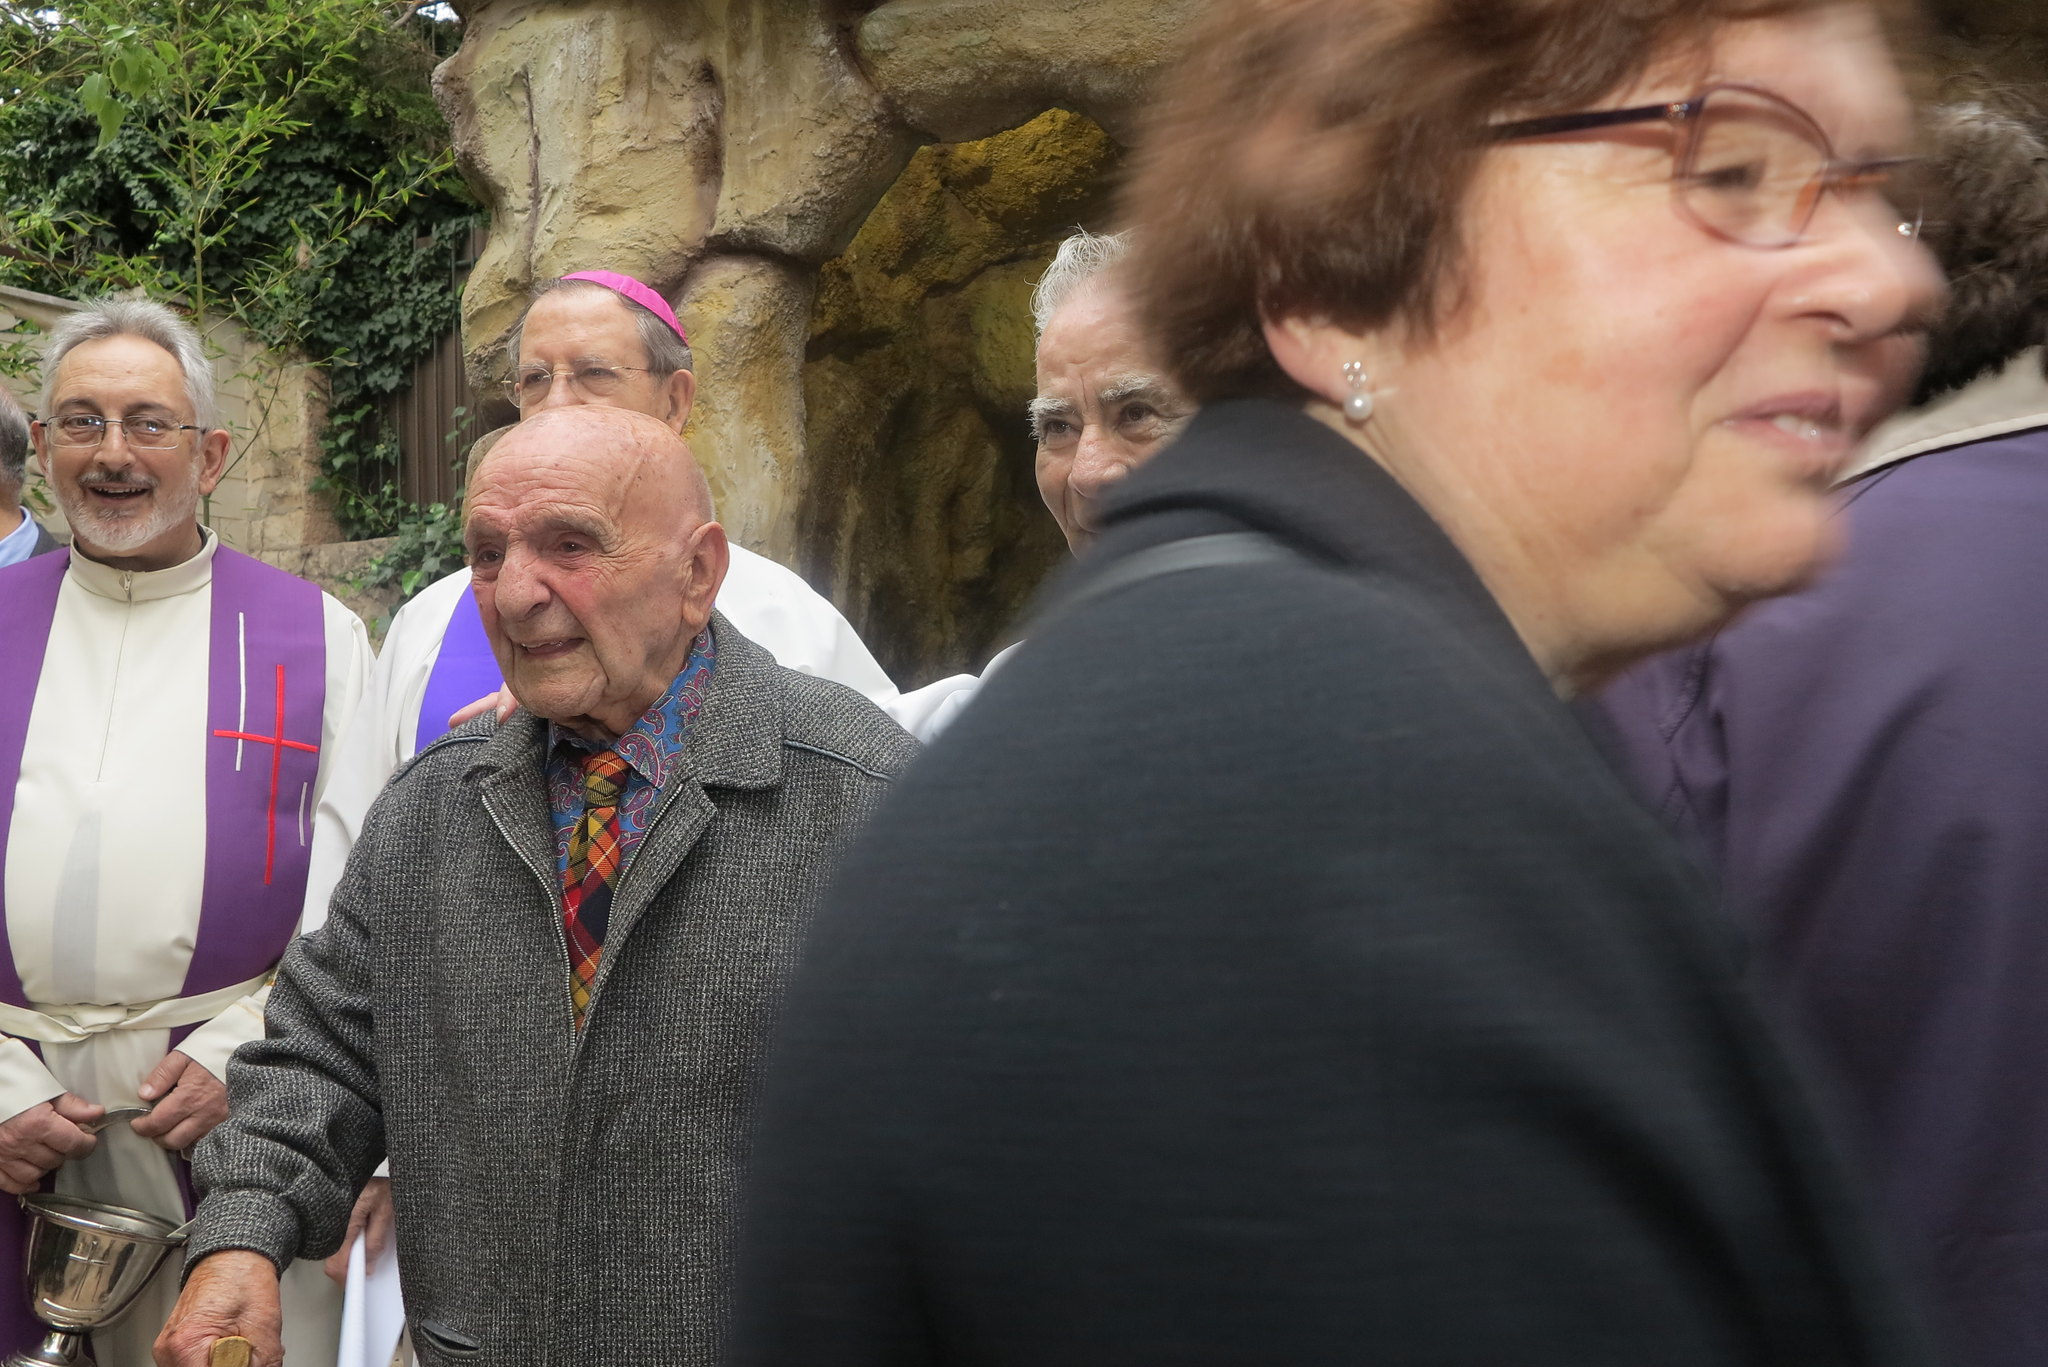 (2016-02-13) - Inauguración Virgen de Lourdes, La Molineta - Archivo La Molineta 2 (62)